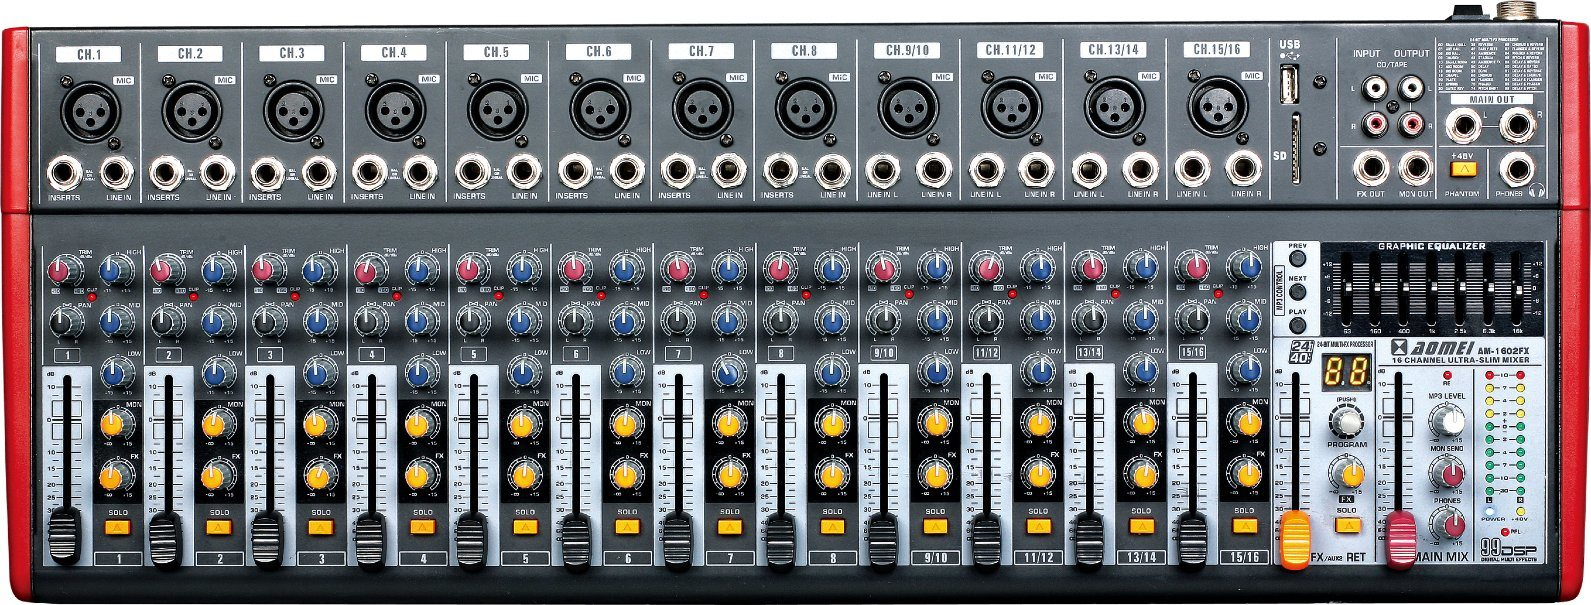 Special Popular Design Smaller Mixer Am-502fx Series Professional Amplifier